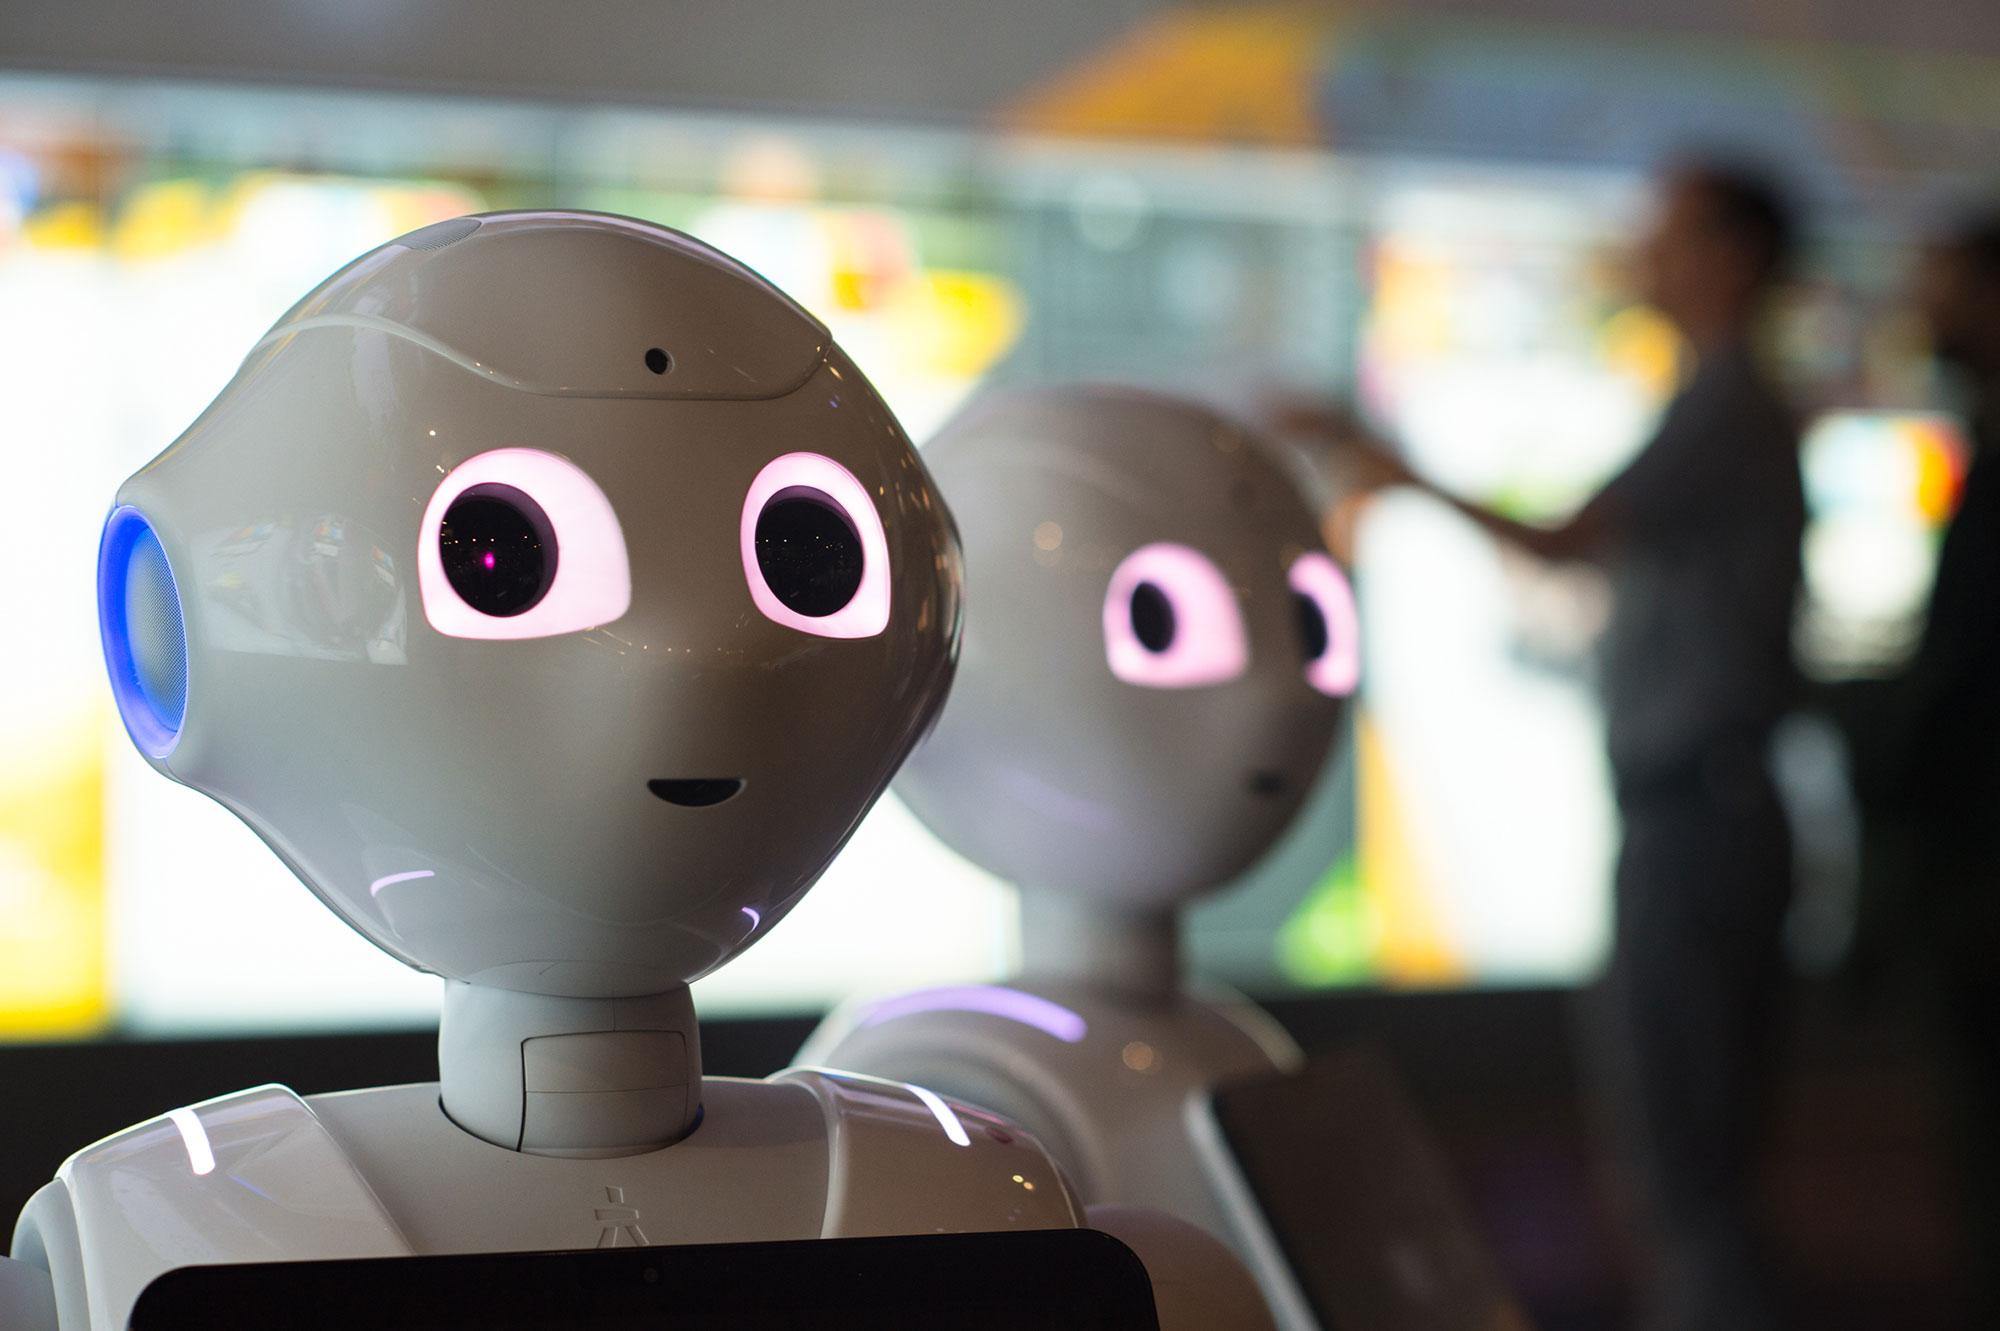 Pepper the robot at QUT